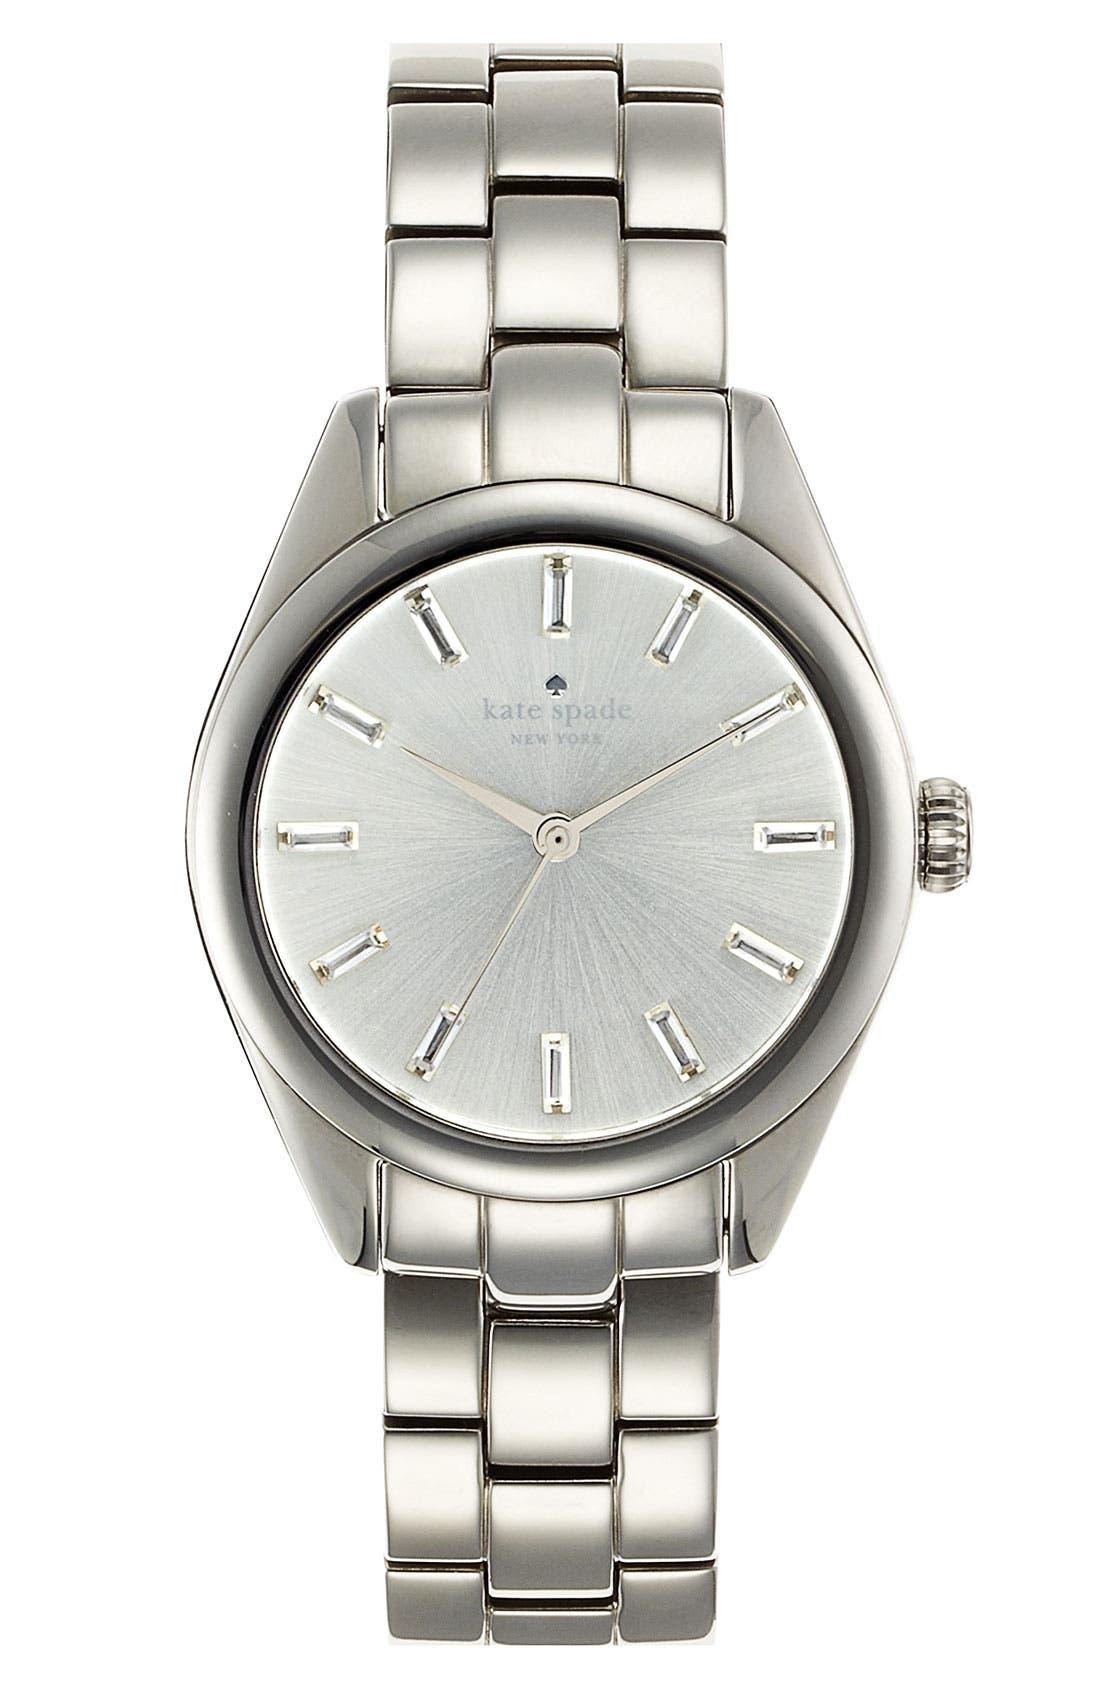 Alternate Image 1 Selected - kate spade new york 'seaport' bracelet watch, 34mm